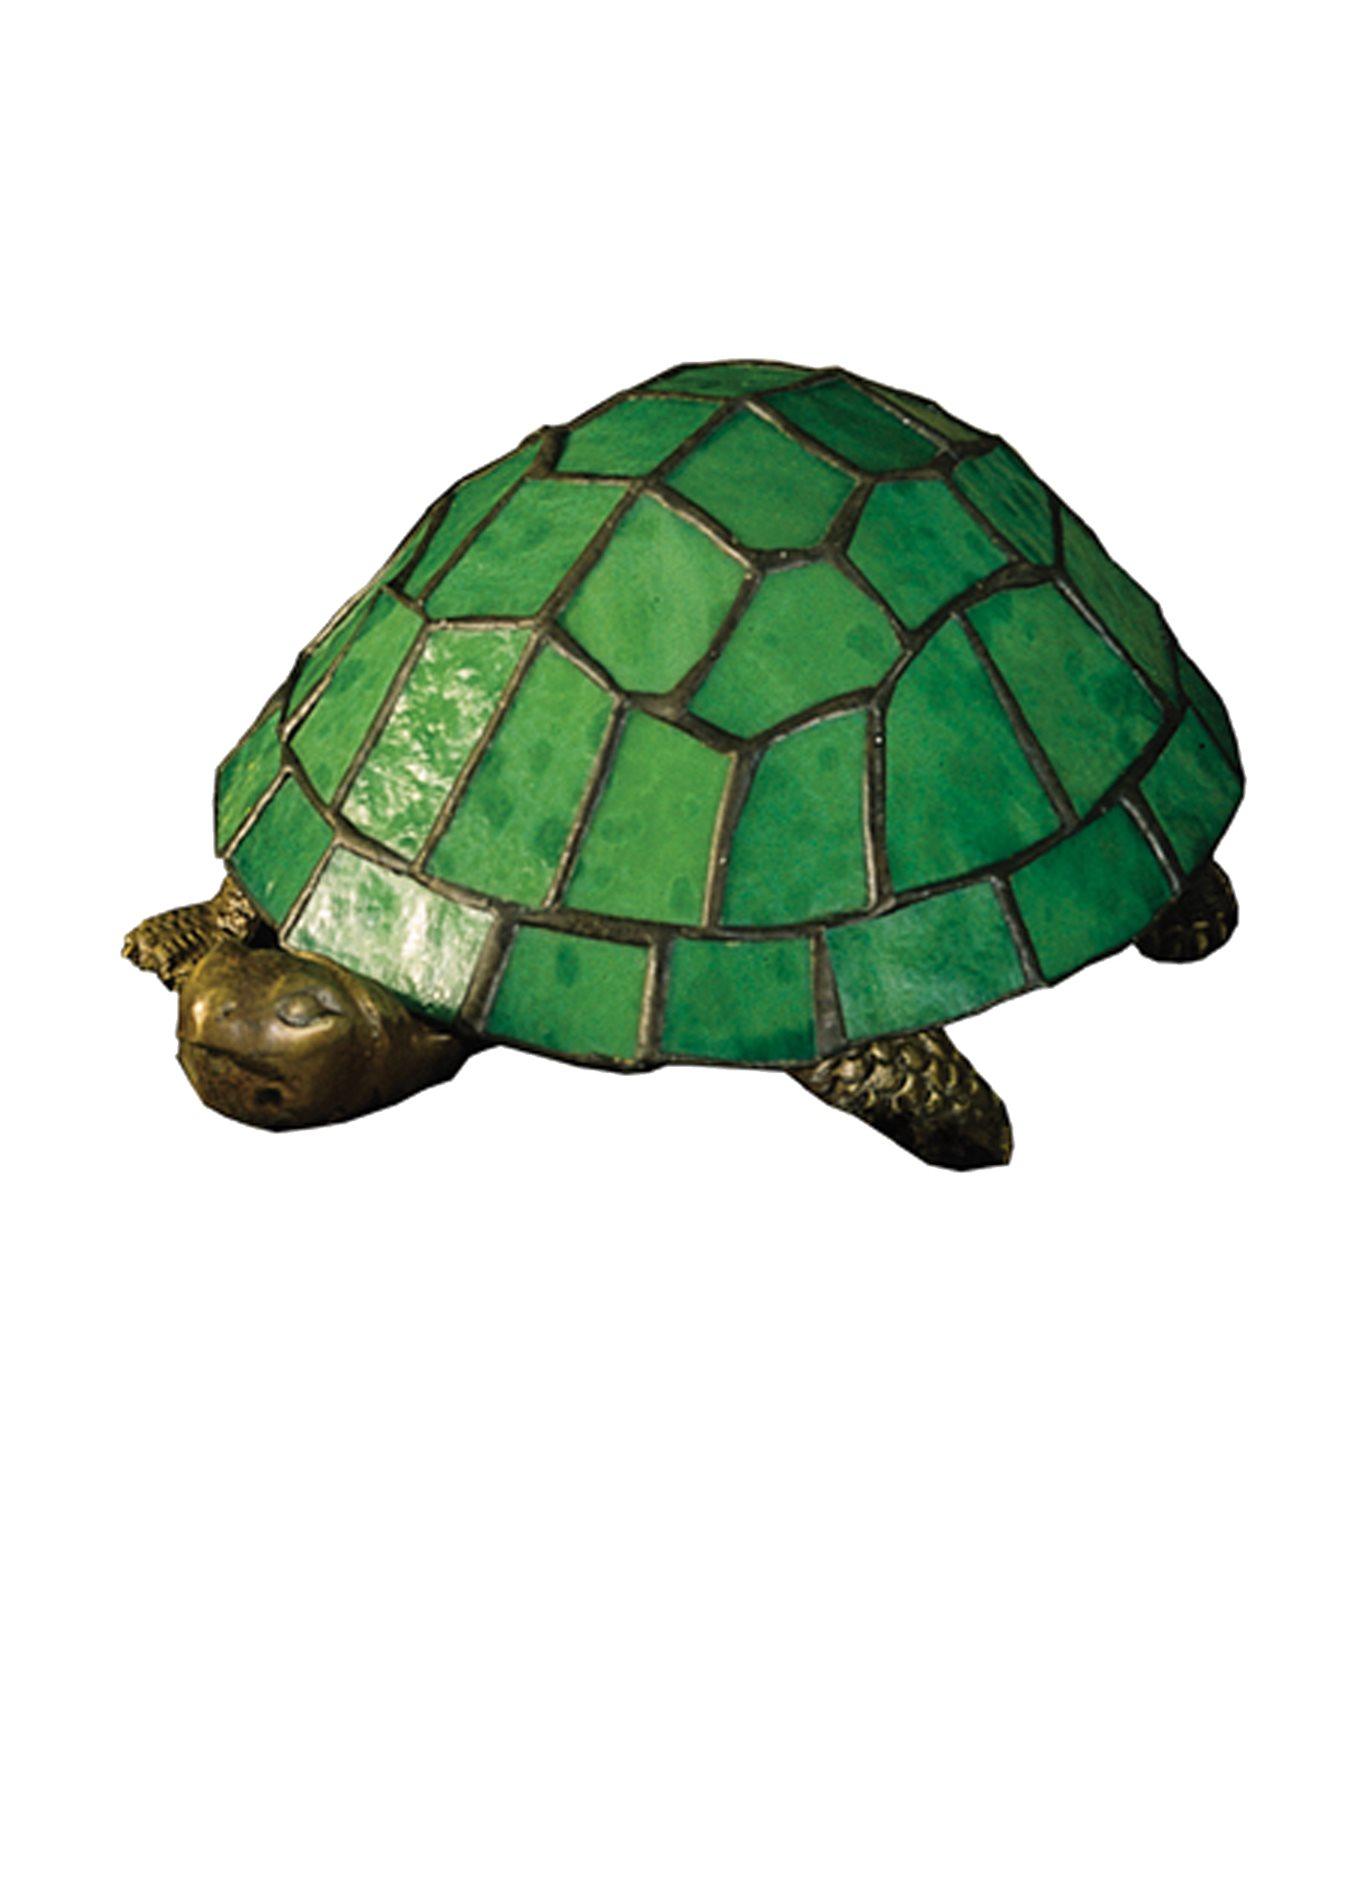 Meyda tiffany 10750 tiffany turtle accent lamp md 10750 - Turtle nite light ...